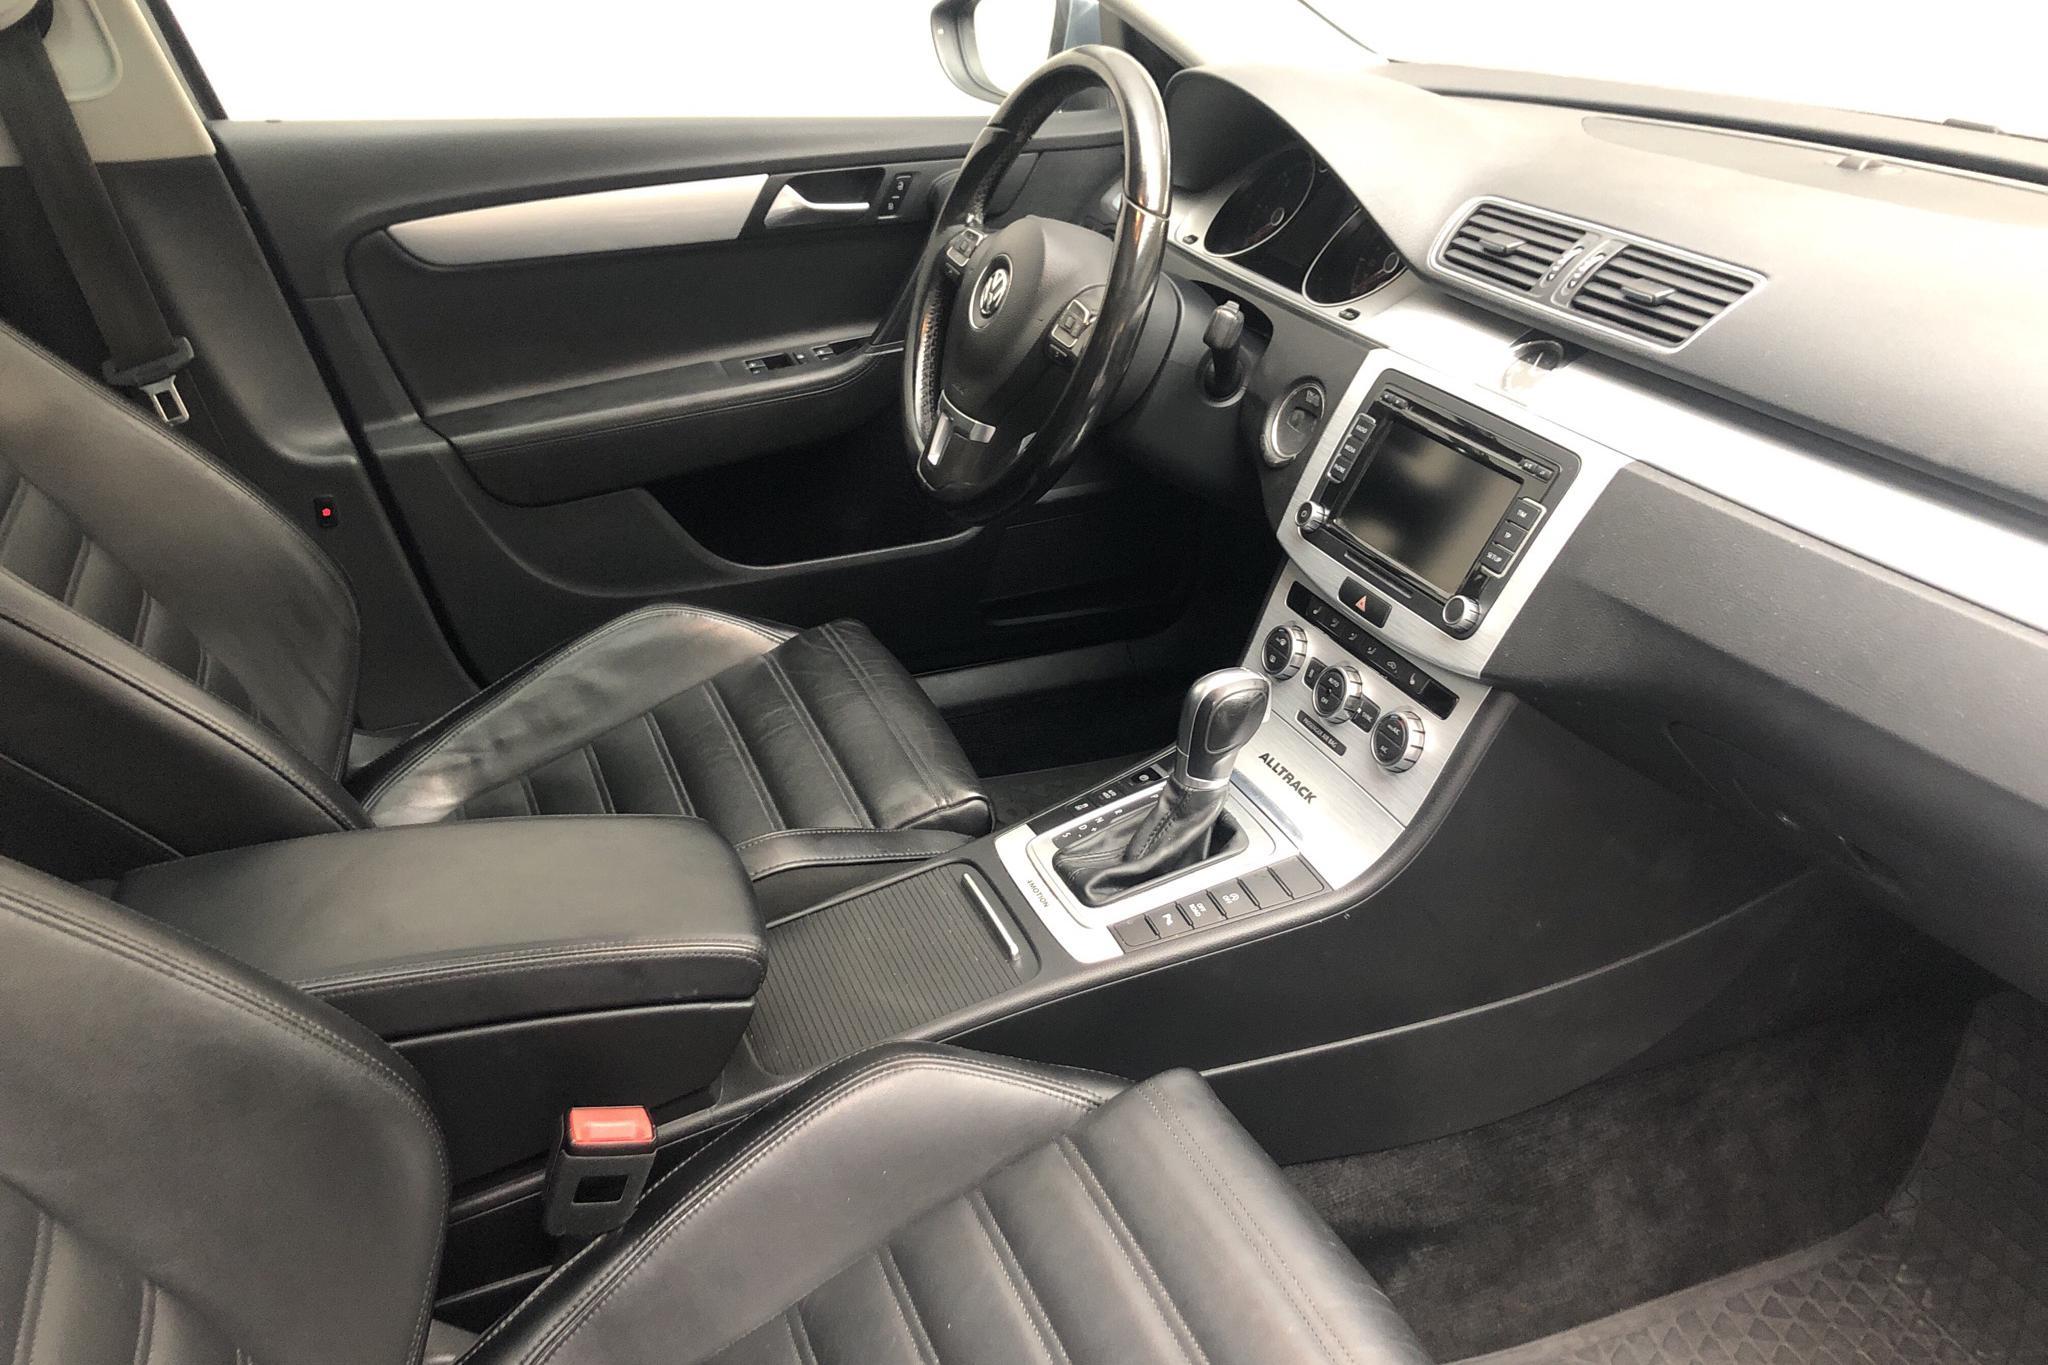 VW Passat Alltrack 2.0 TDI BlueMotion Technology 4Motion (177hk) - 229 590 km - Automatic - Dark Grey - 2015